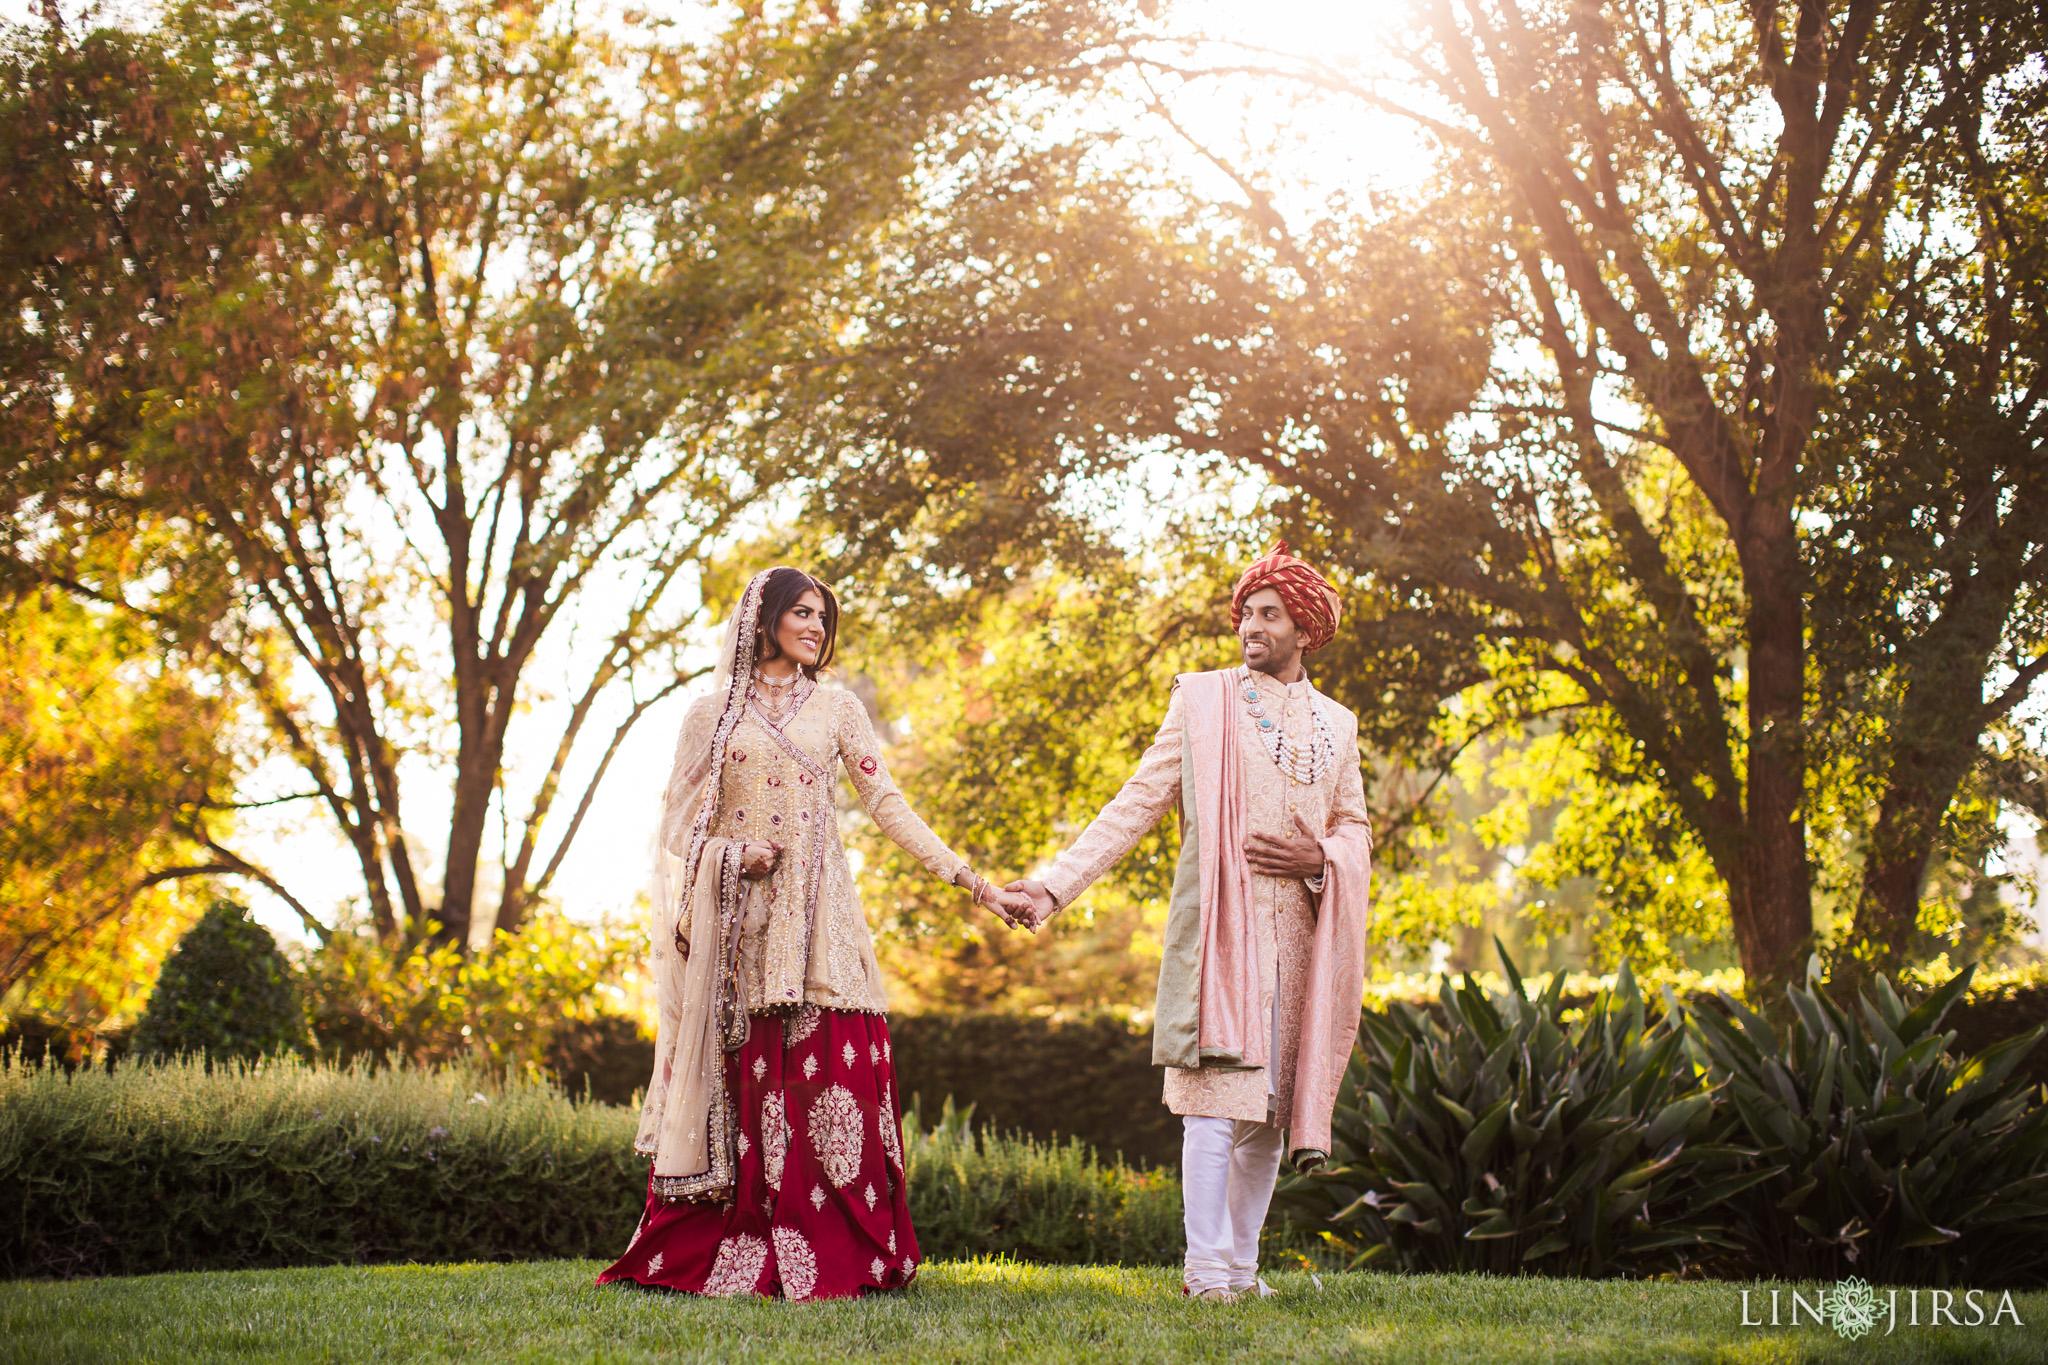 013 four seasons westlake village muslim wedding photography